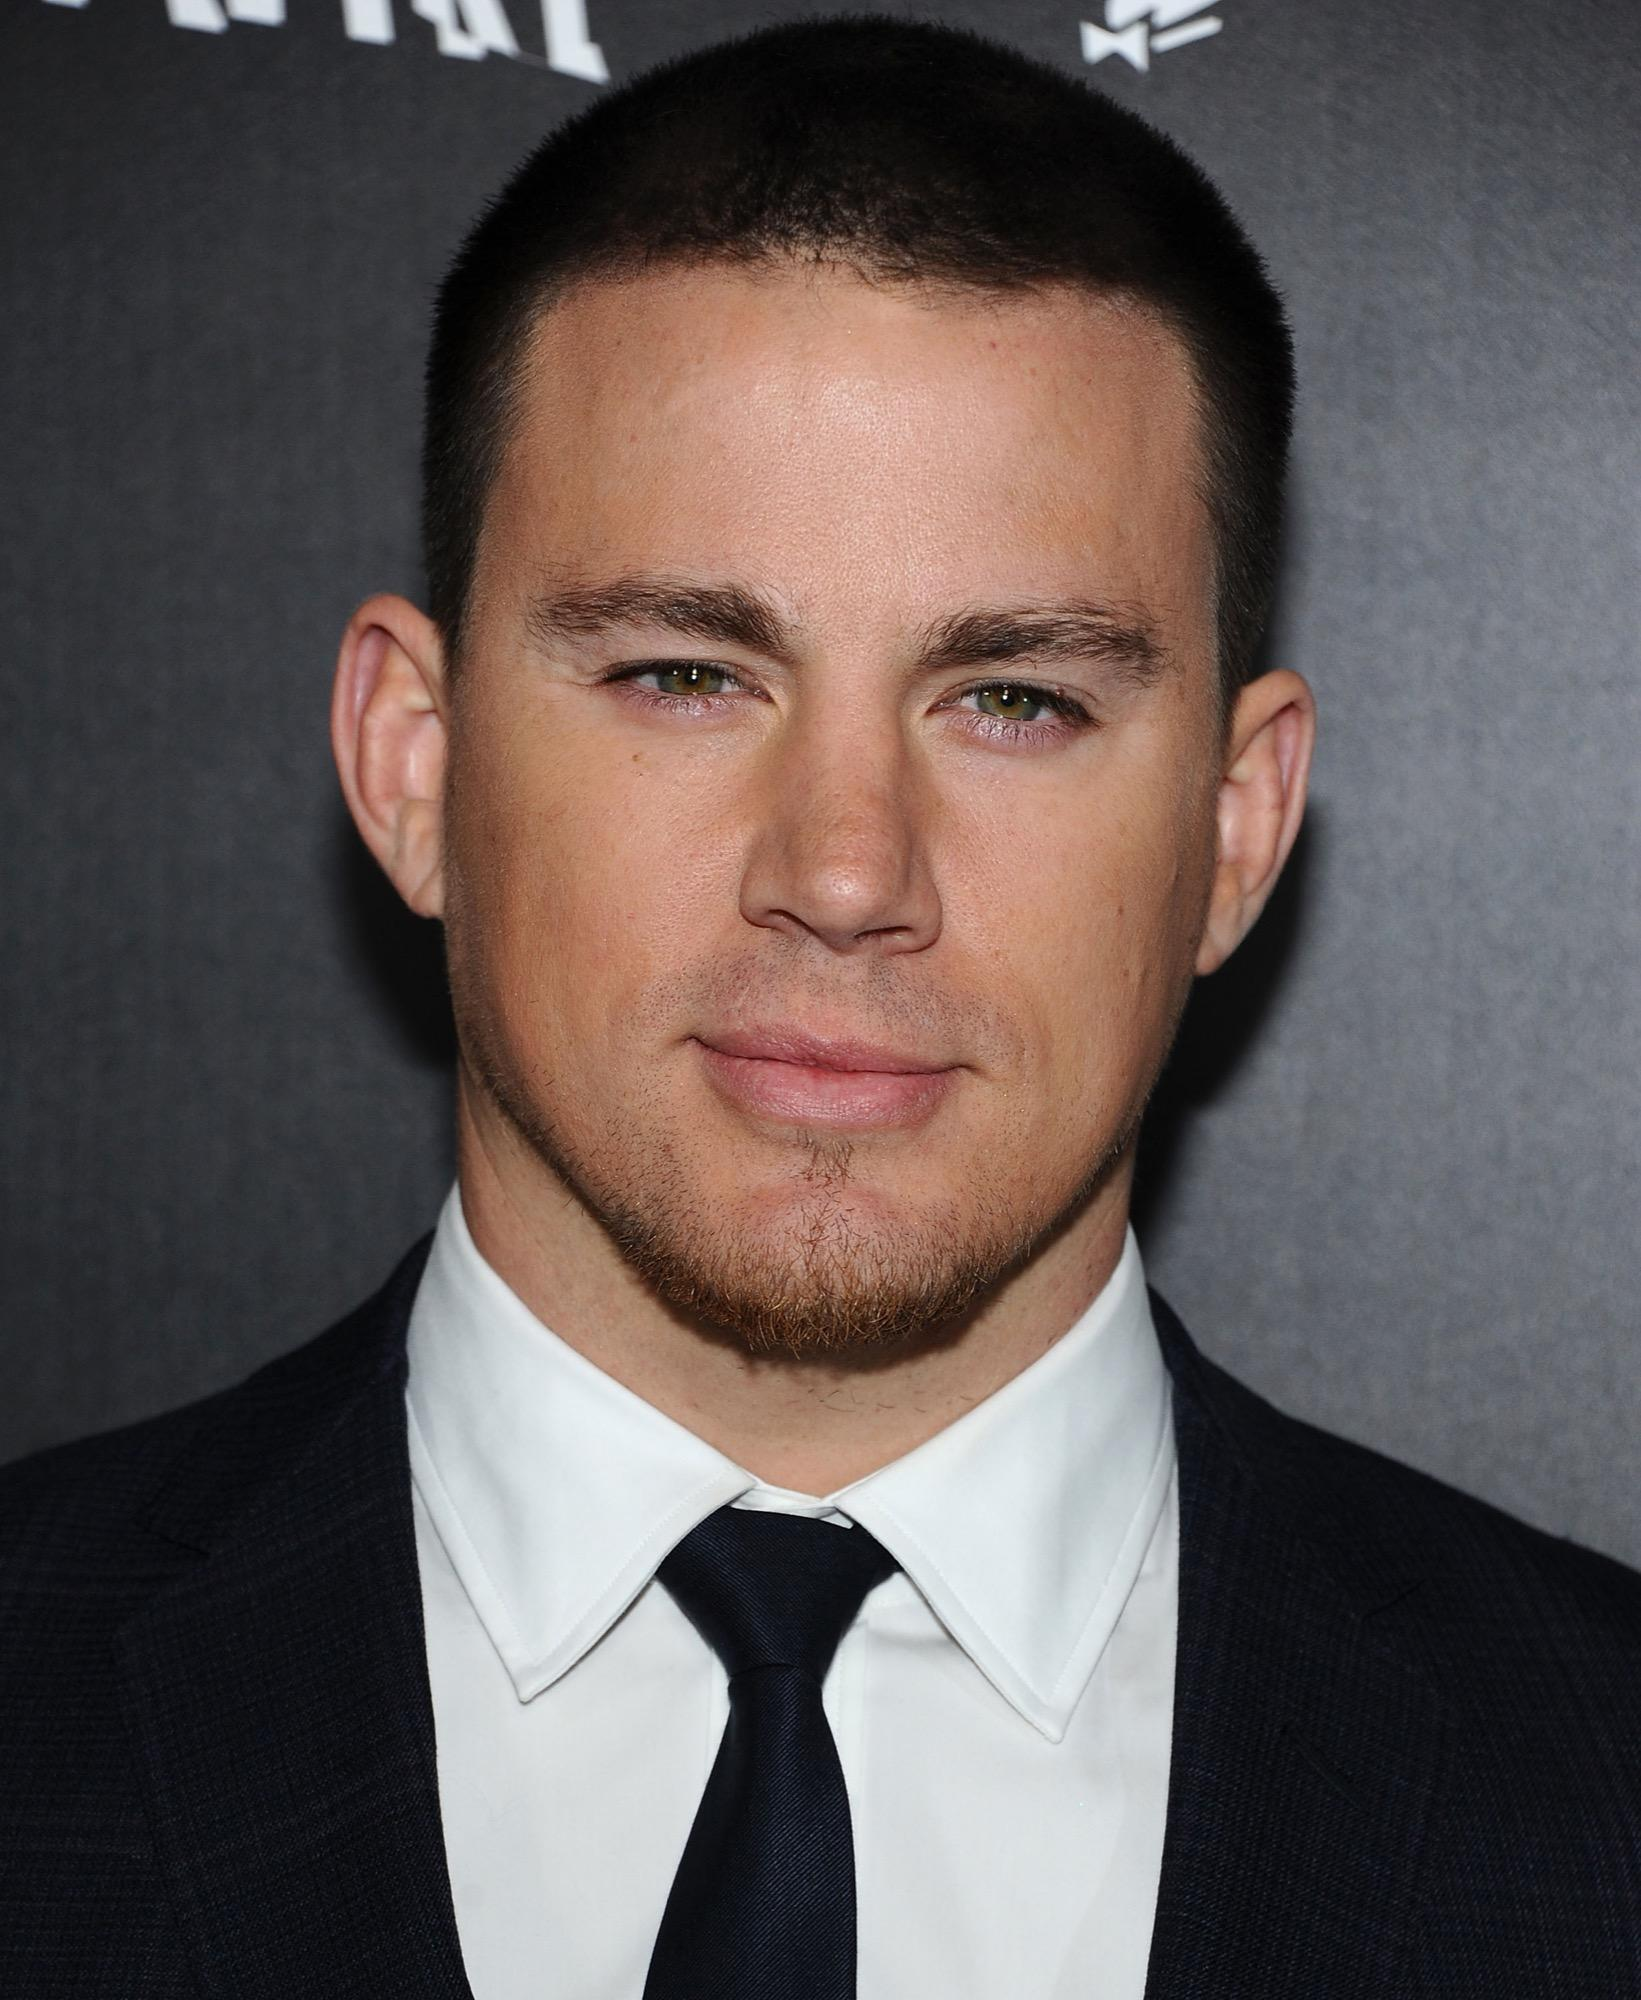 Sexiest Man Alive 2012 - Channing Tatum